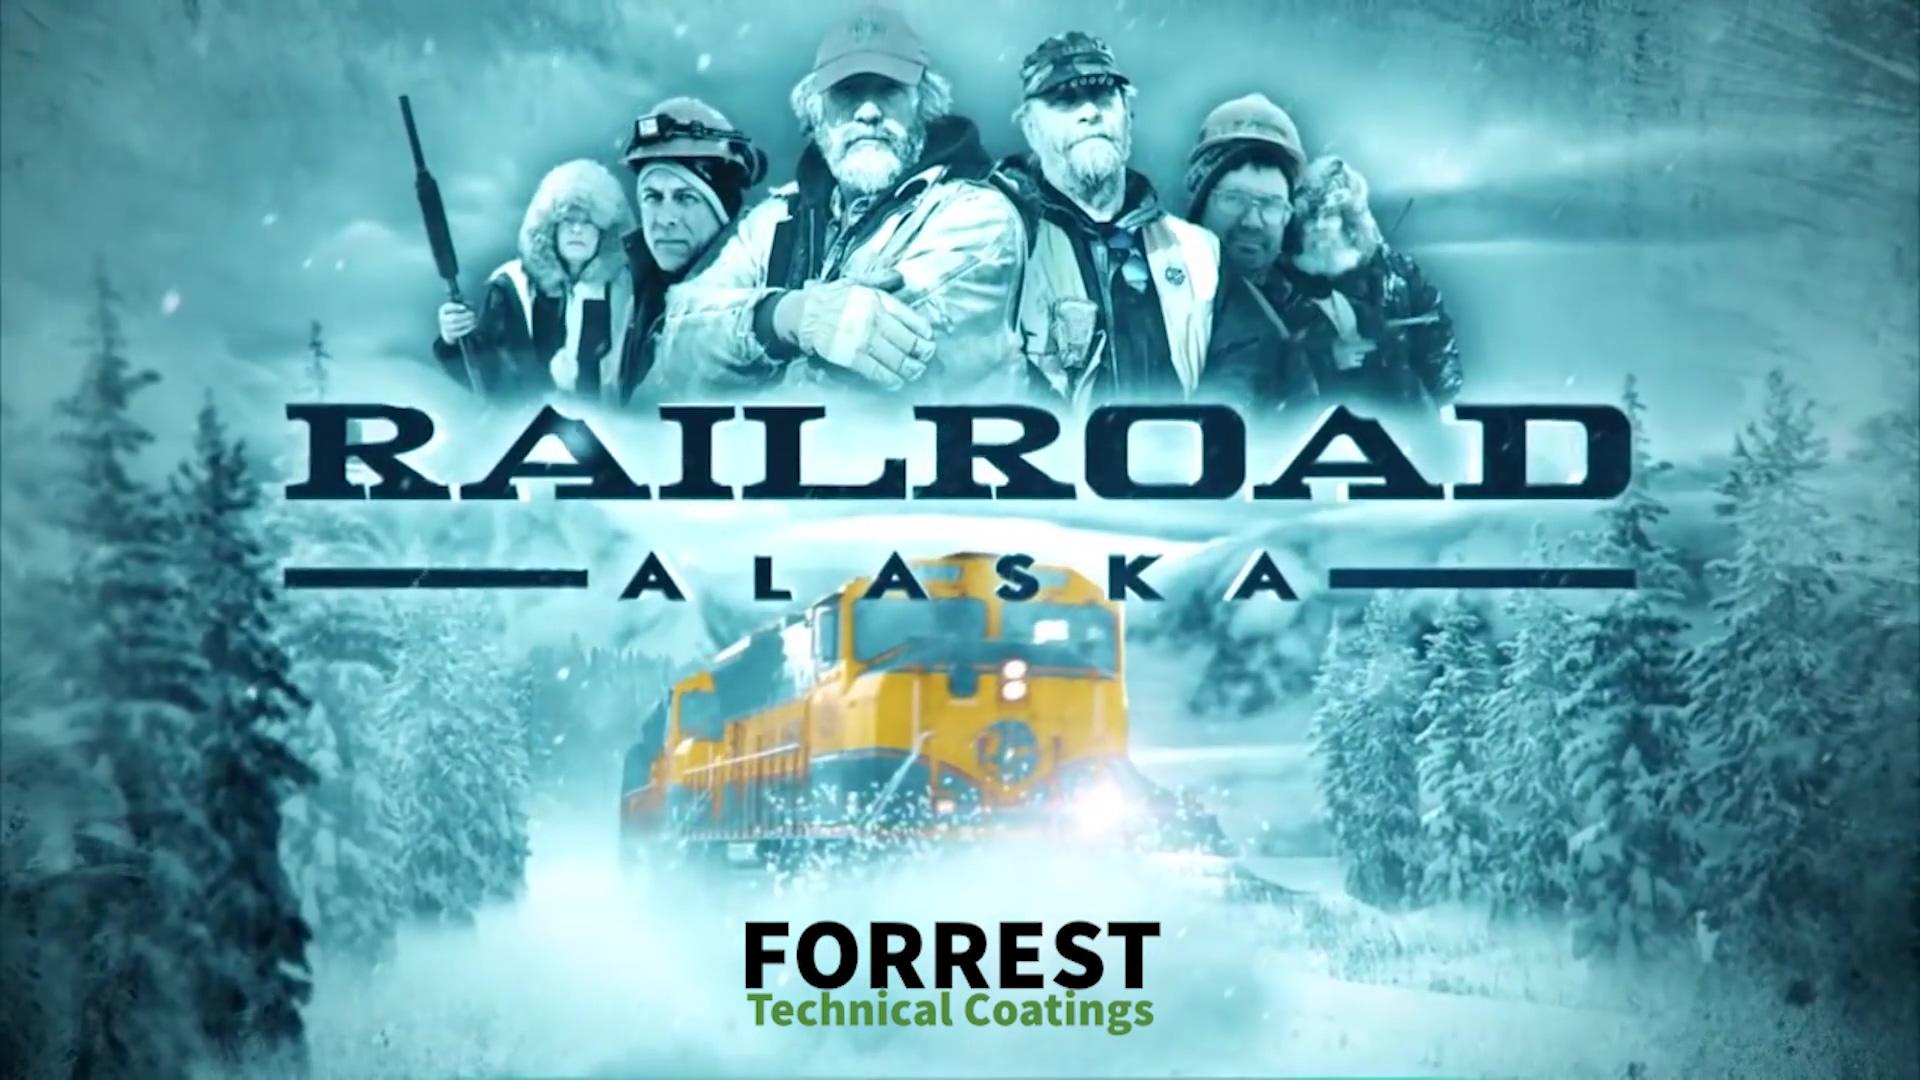 ForrestFireSnake01